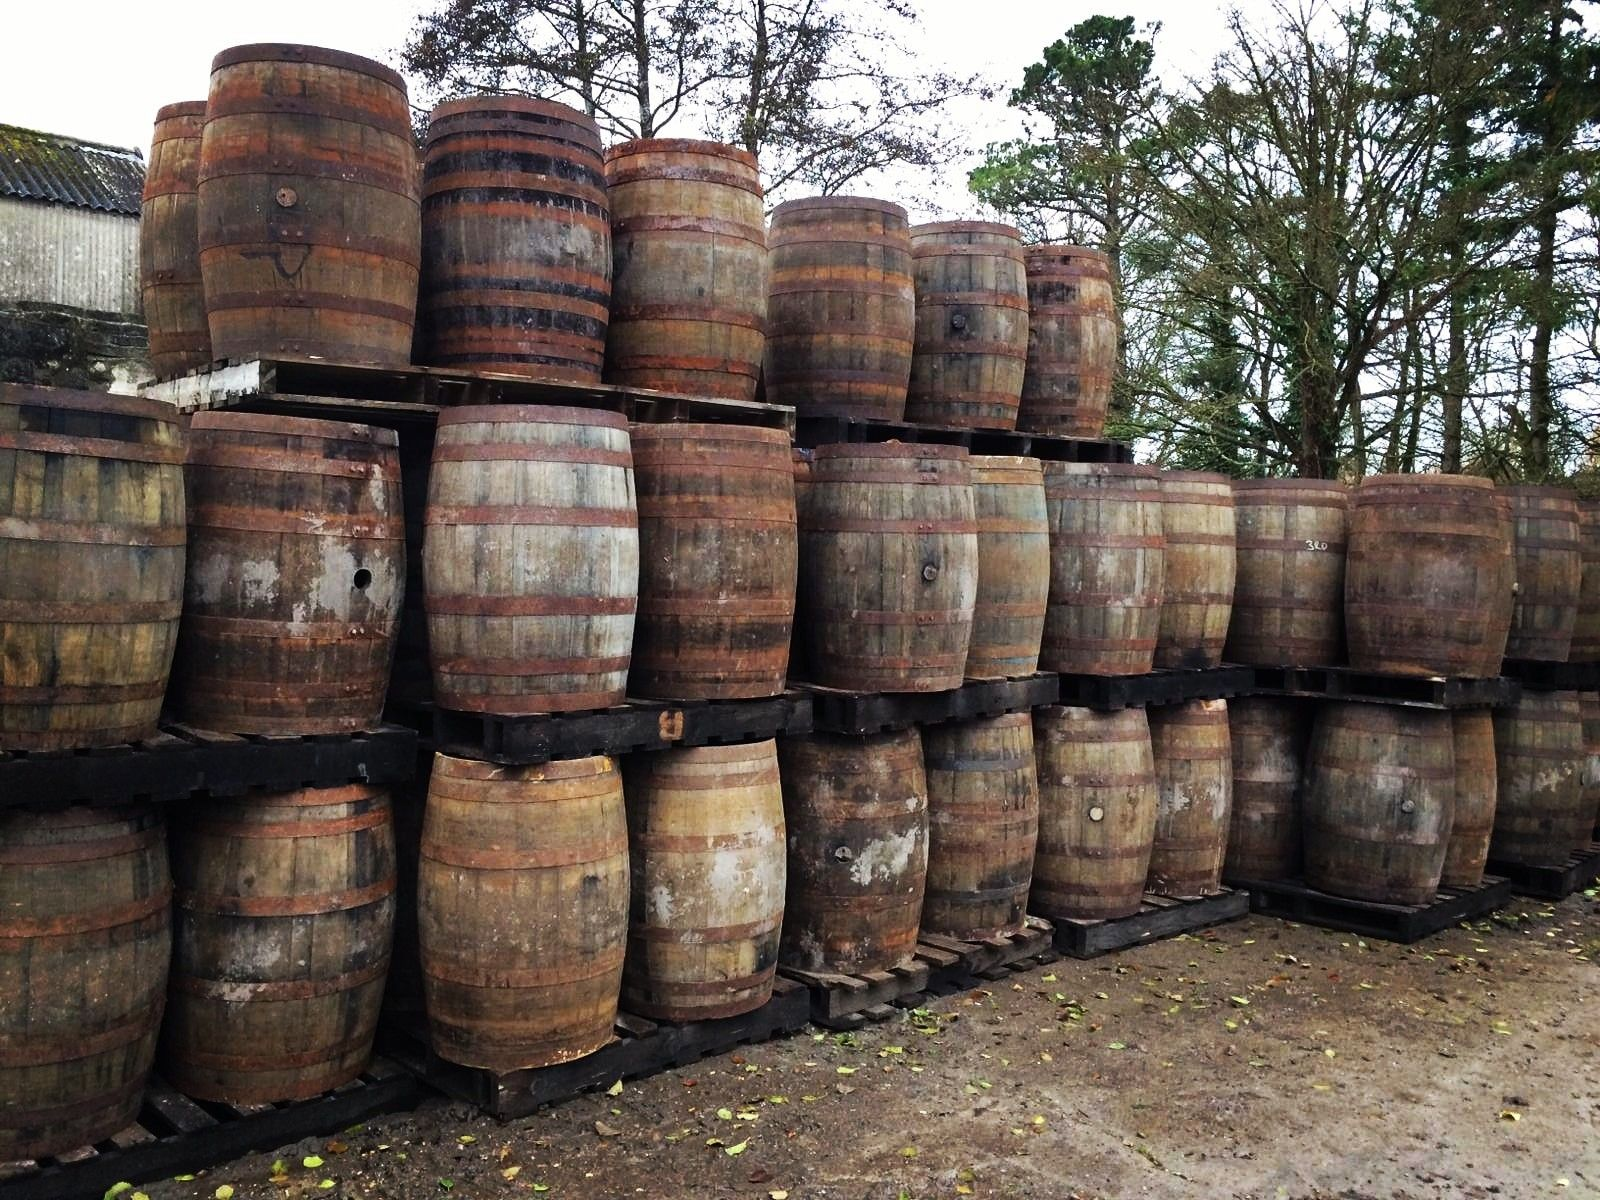 Home Barrels for sale, Whiskey barrels for sale, Irish